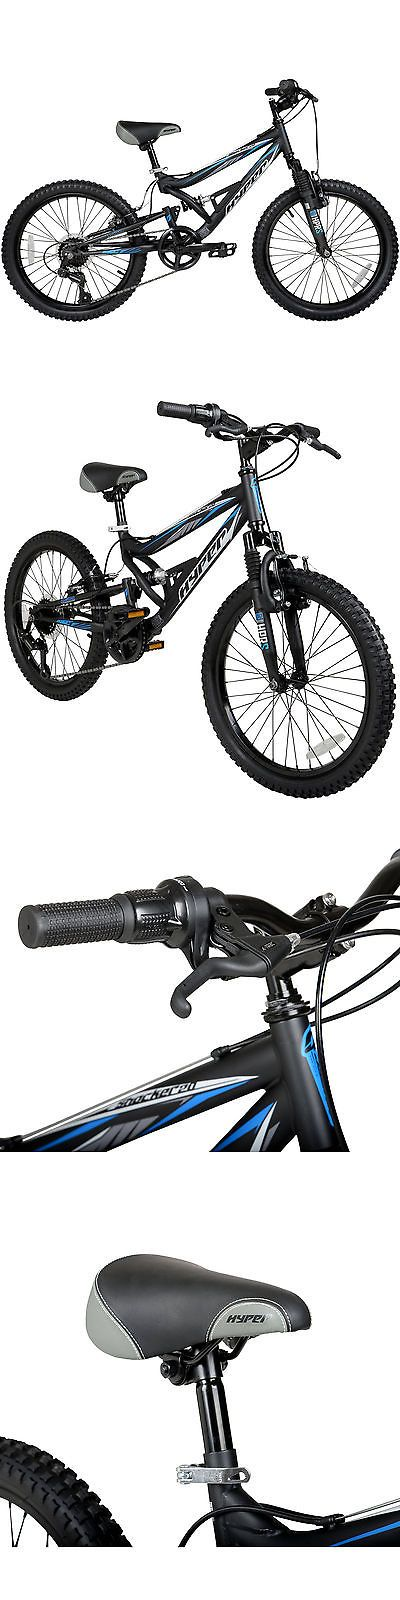 Bicycles 177831: New 20 Hyper Shocker Boys Bike Kids Bicycle Shimano Steel Suspension Frame -> BUY IT NOW ONLY: $103.99 on eBay!